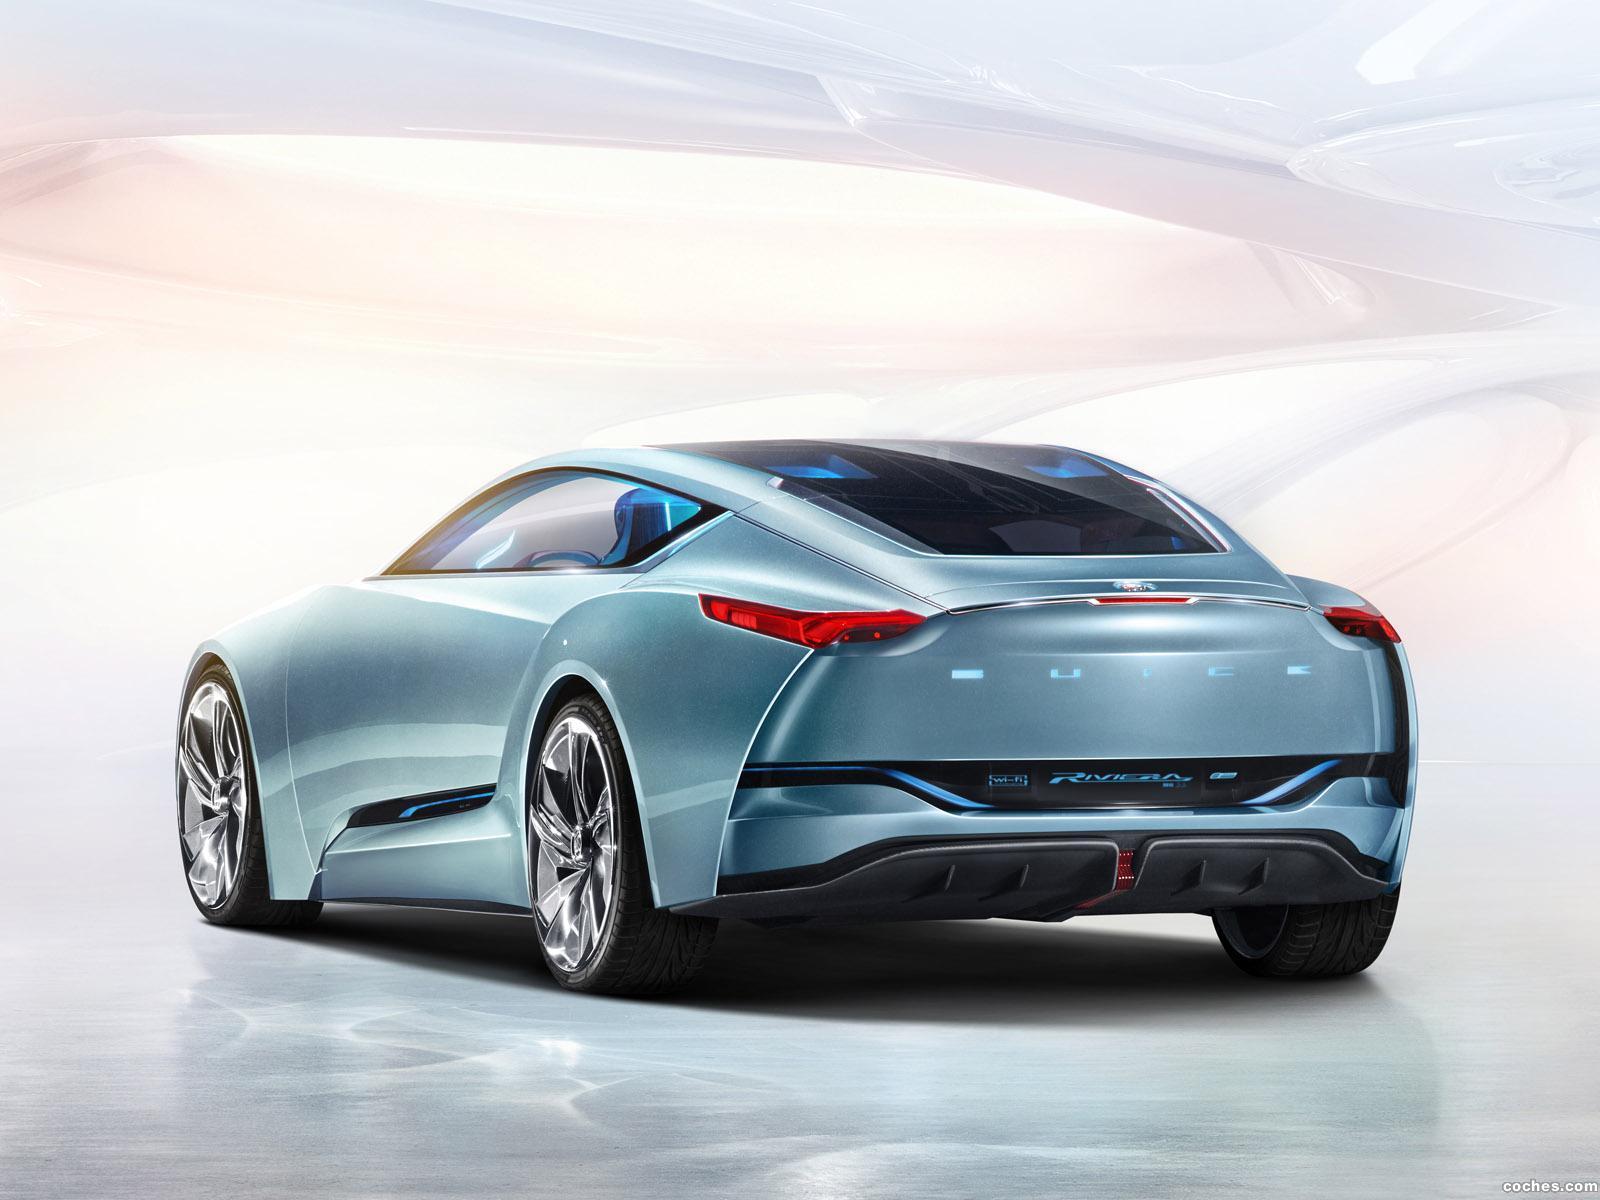 Foto 2 de Buick Riviera Concept 2013